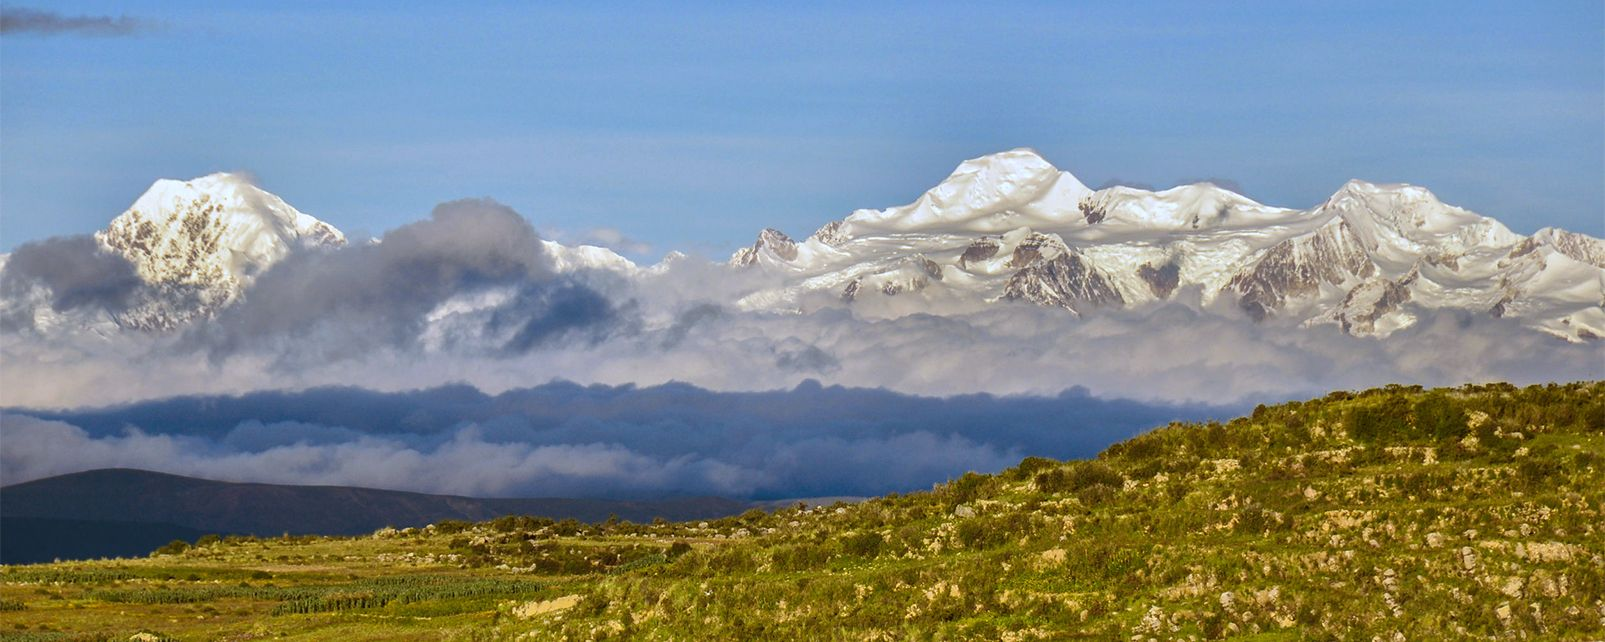 La cordillère royale , La Cordillère Royale , Bolivie